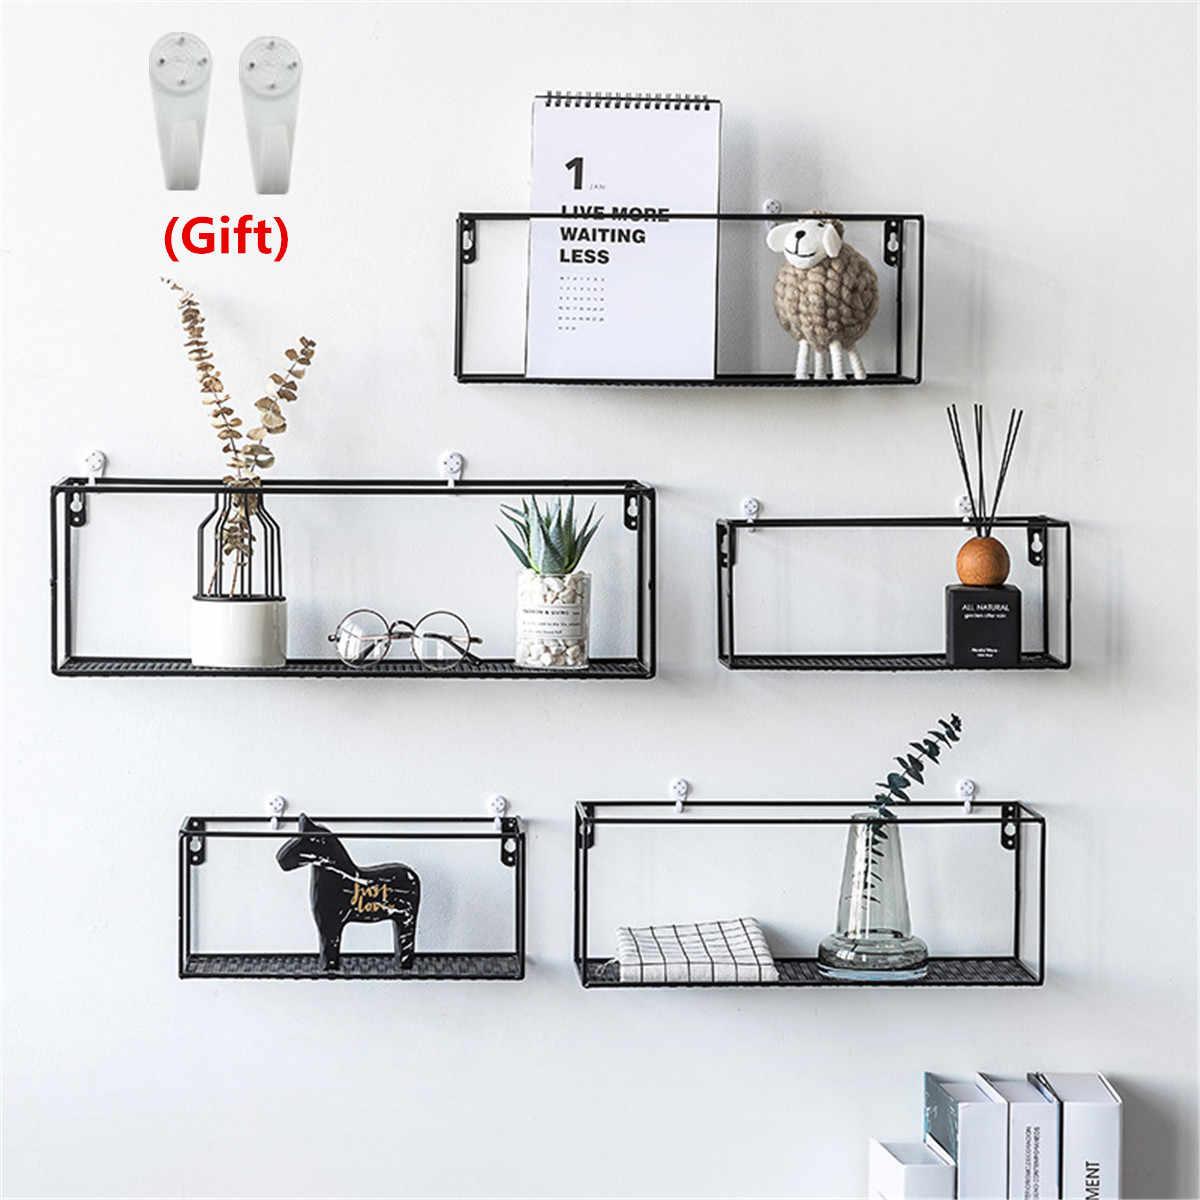 Iron Wall Shelf Wall Mounted Storage Rack Organization For Kitchen Bedroom Home Decor Kid Room Diy Wall Decoration Holder